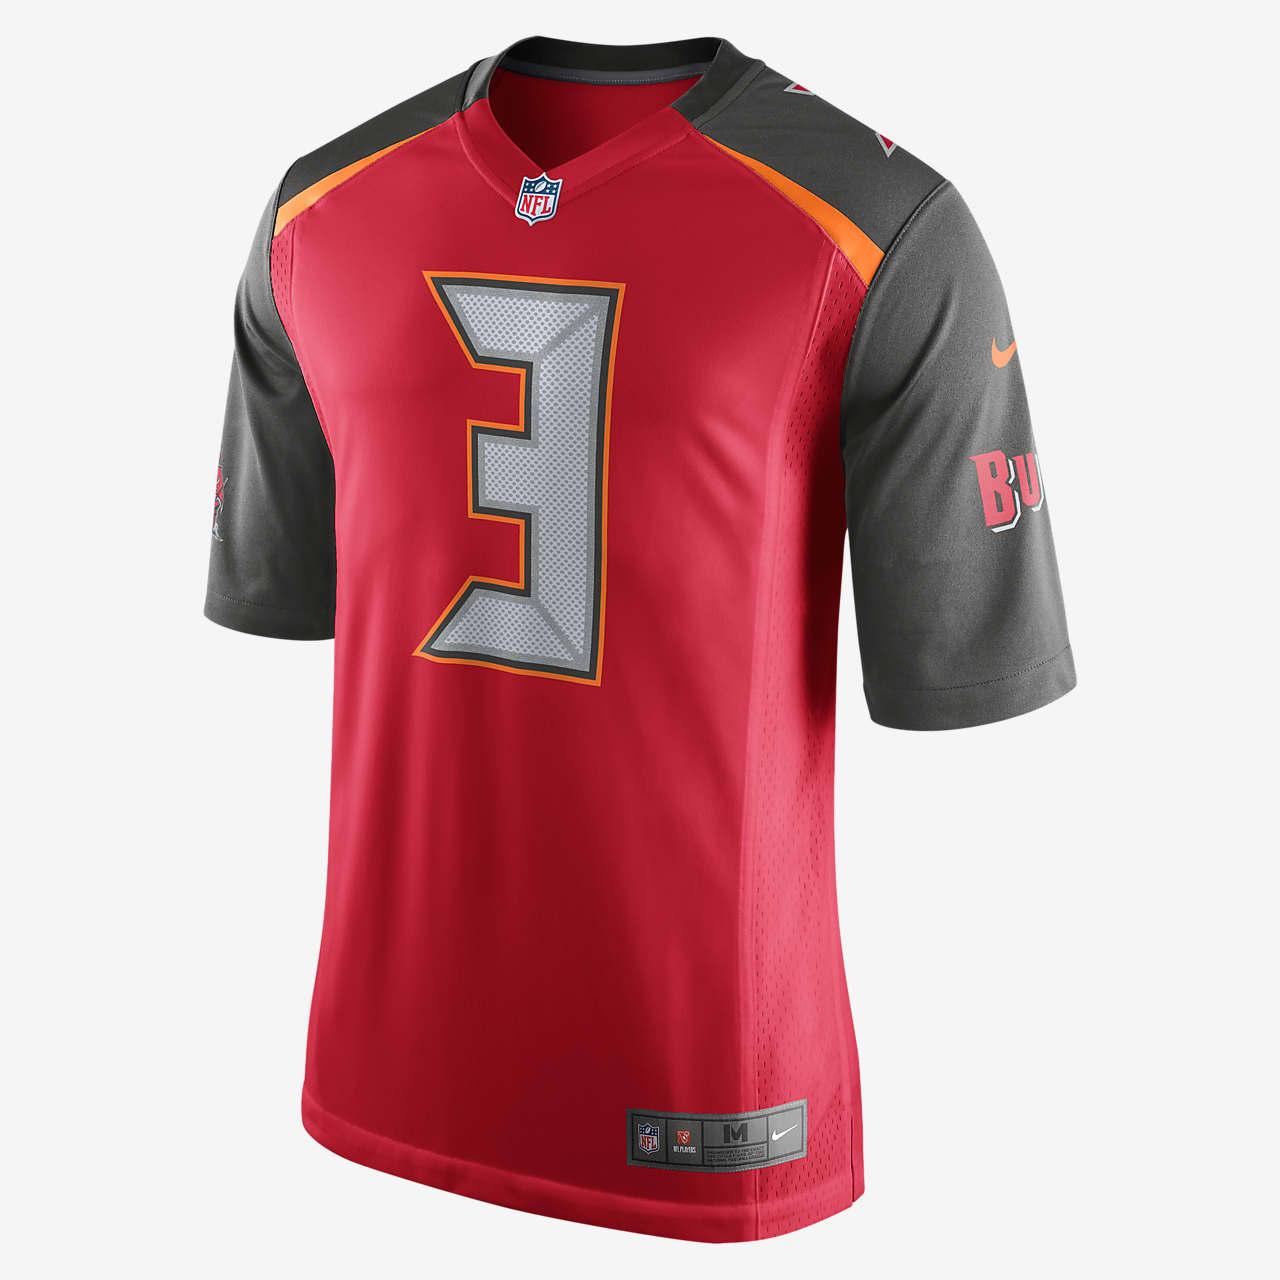 NFL Tampa Bay Buccaneers (Jameis Winston) Men's American Football Home Game Jersey